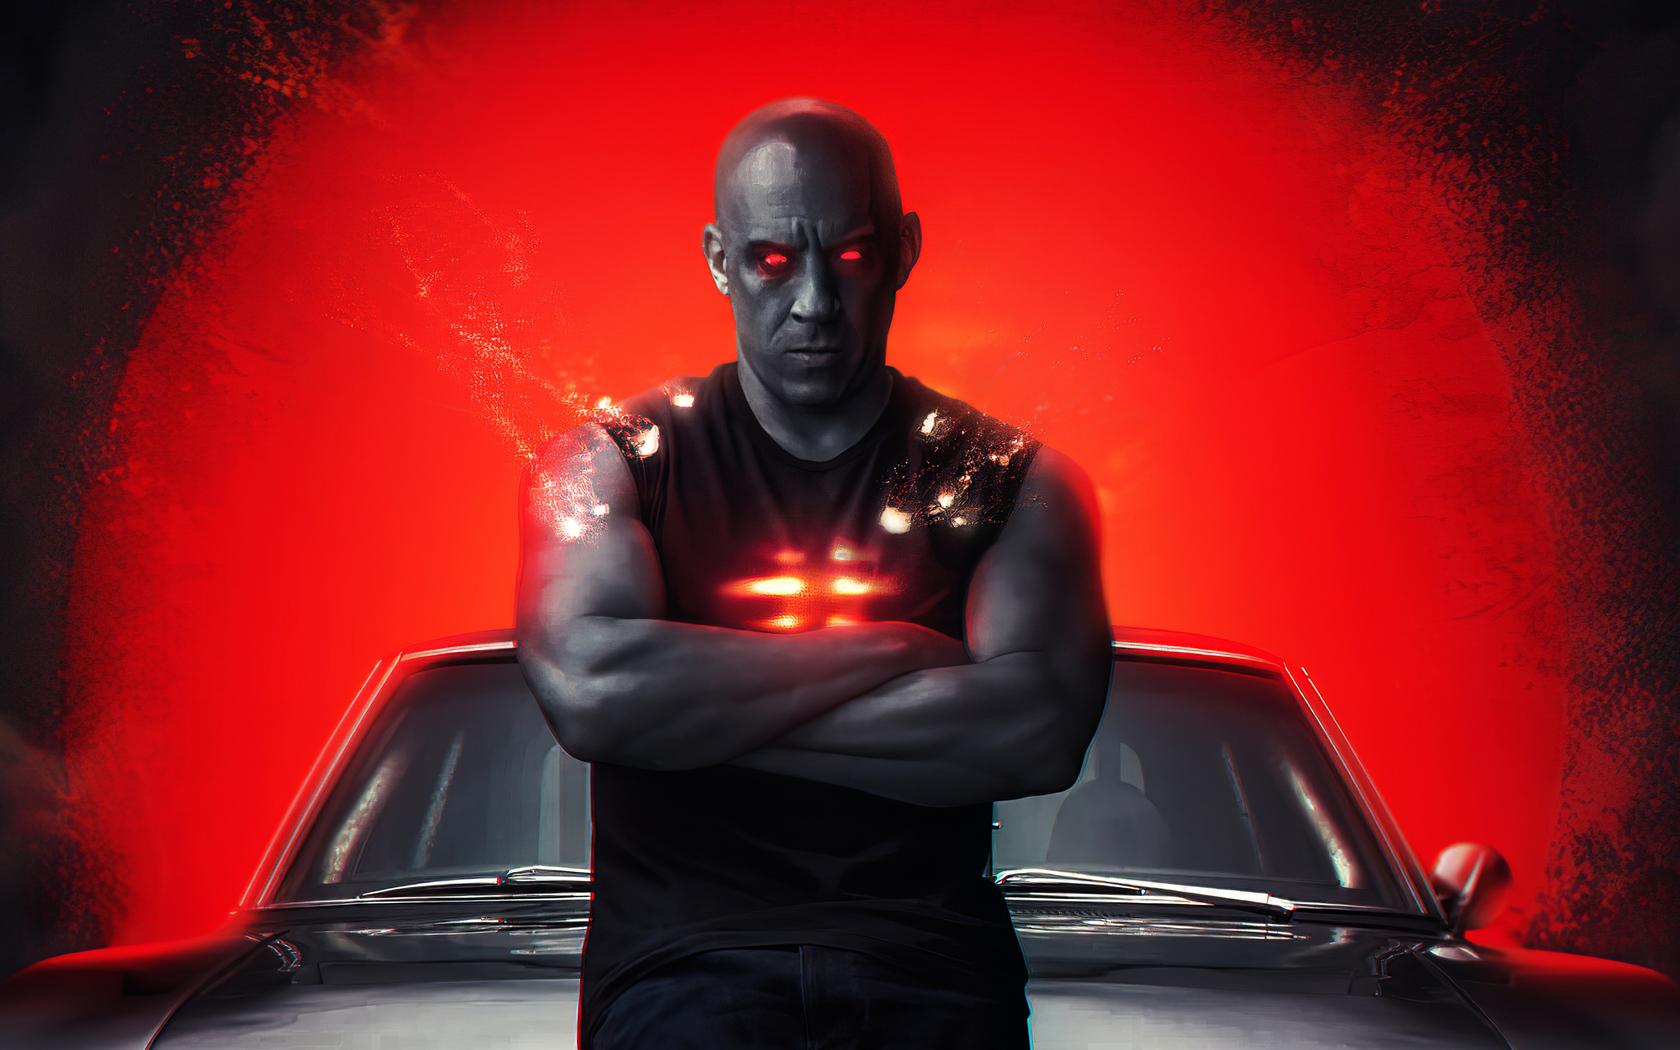 bloodshot-x-fast-and-furious-9-movie-4k-2020-2k.jpg